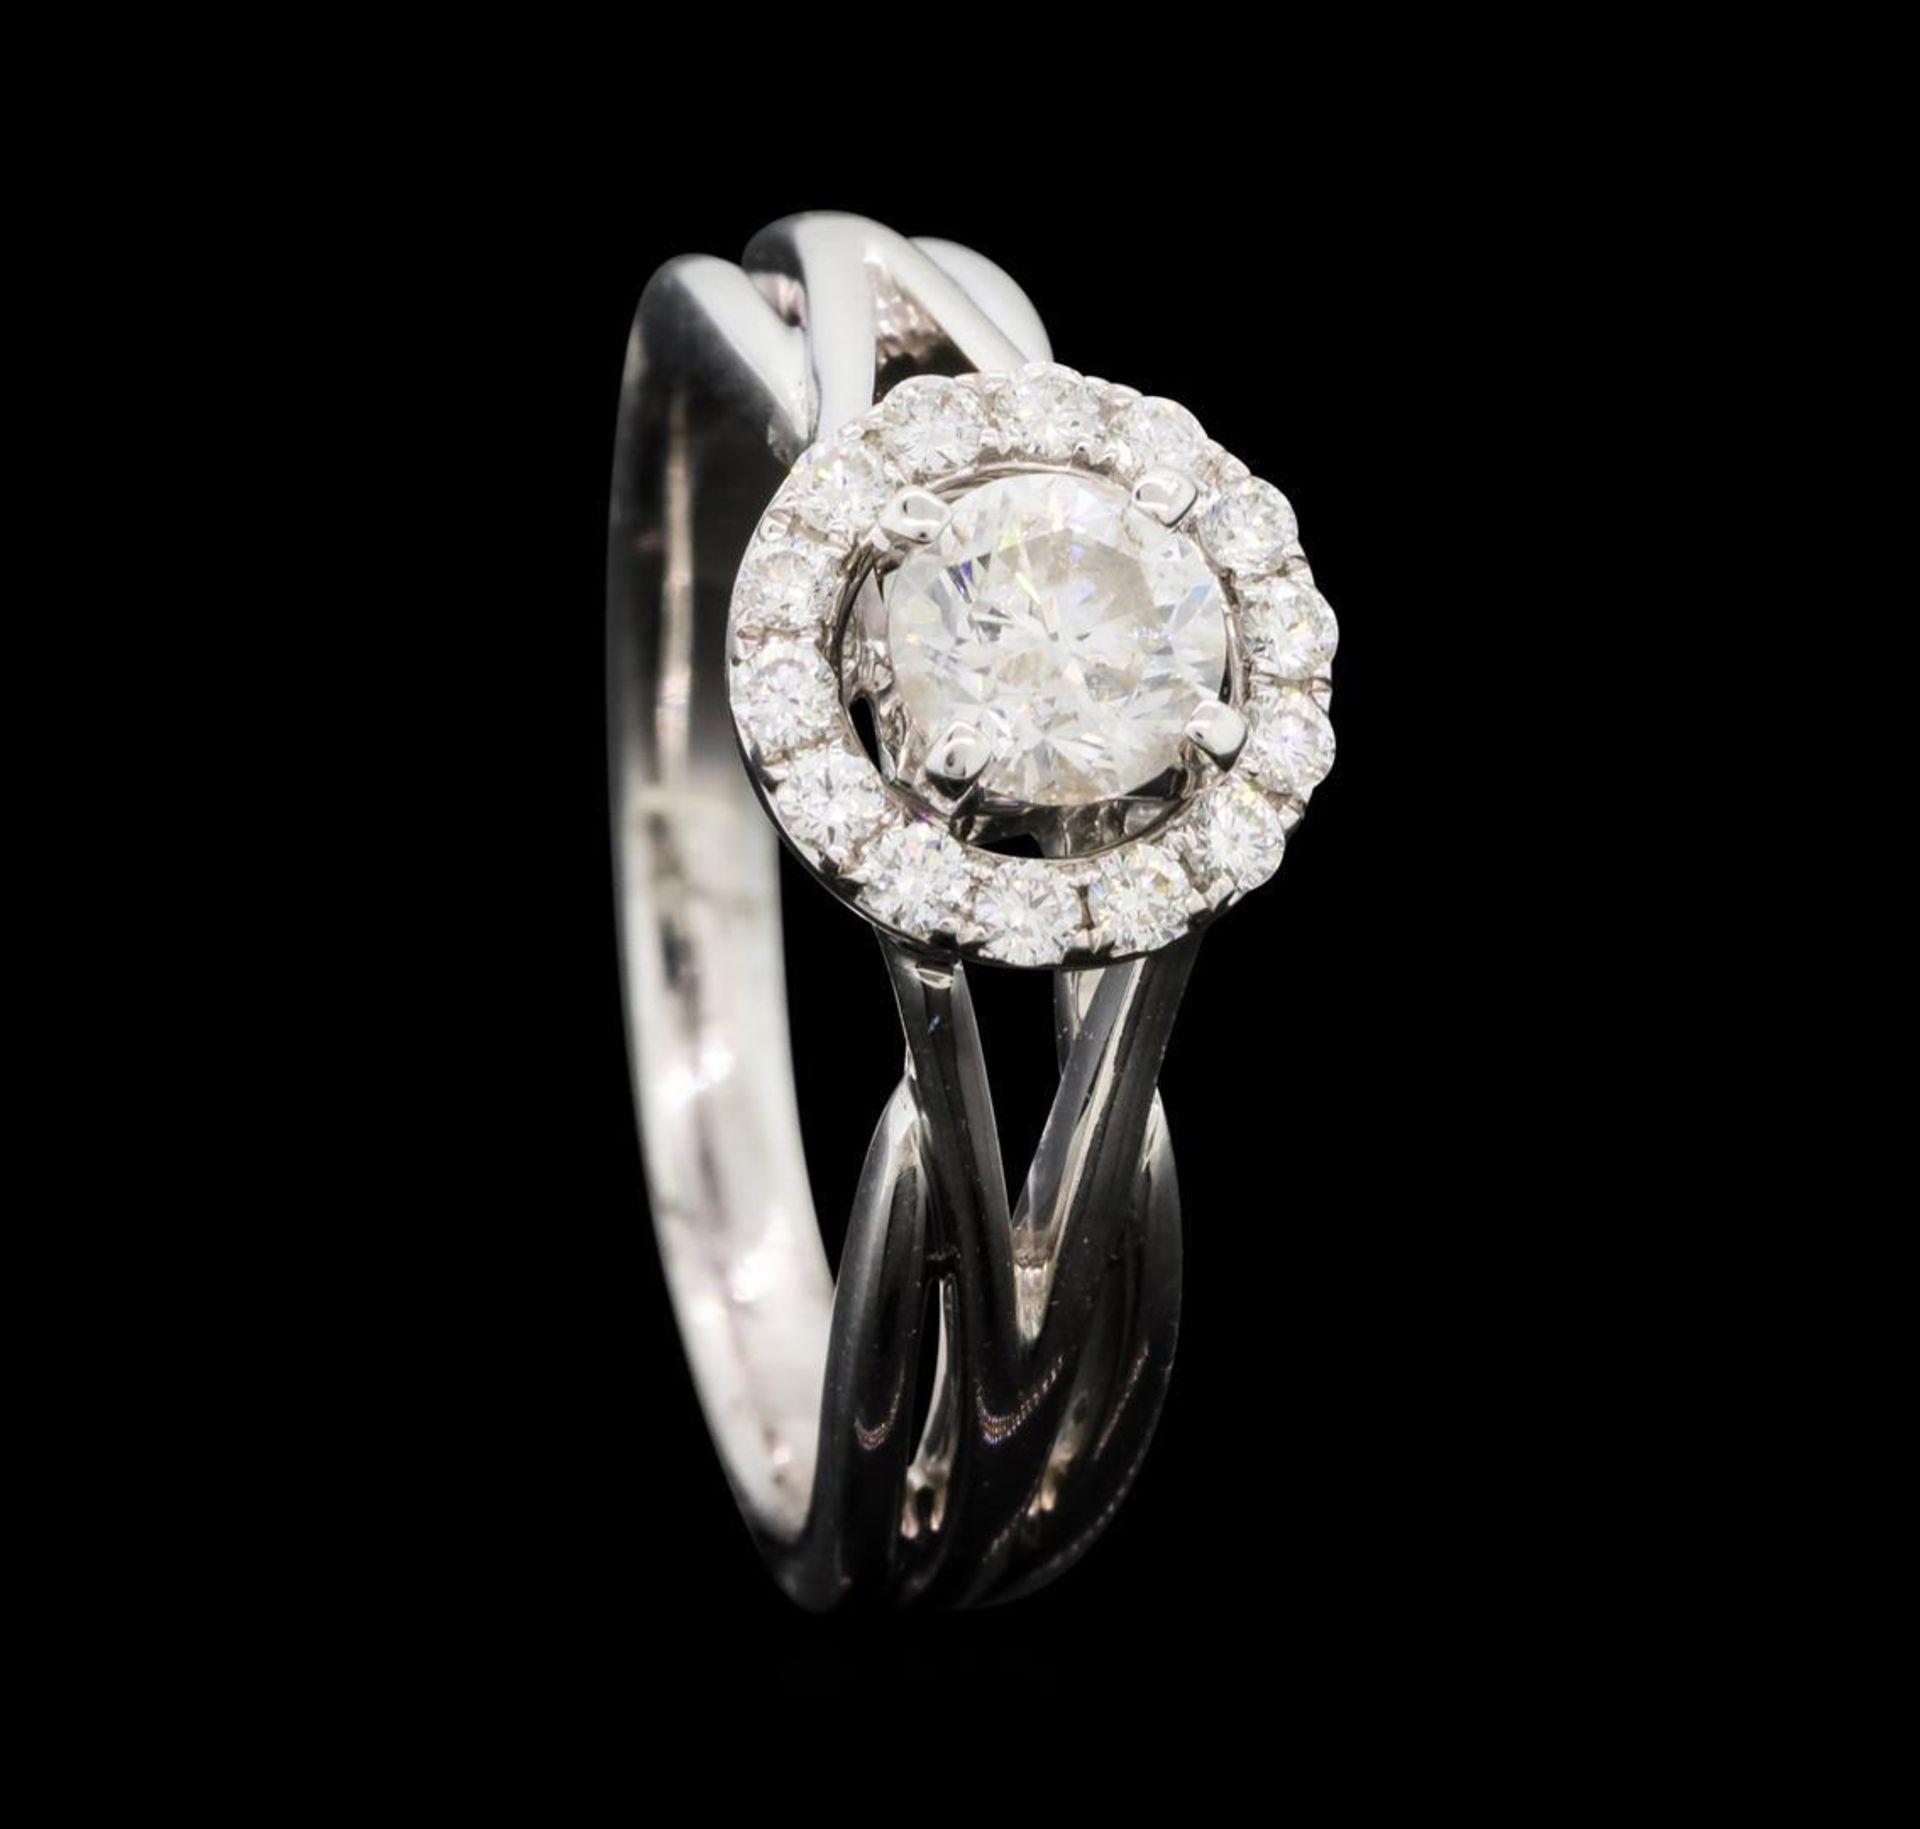 0.74 ctw Diamond Ring - 14KT White Gold - Image 4 of 5